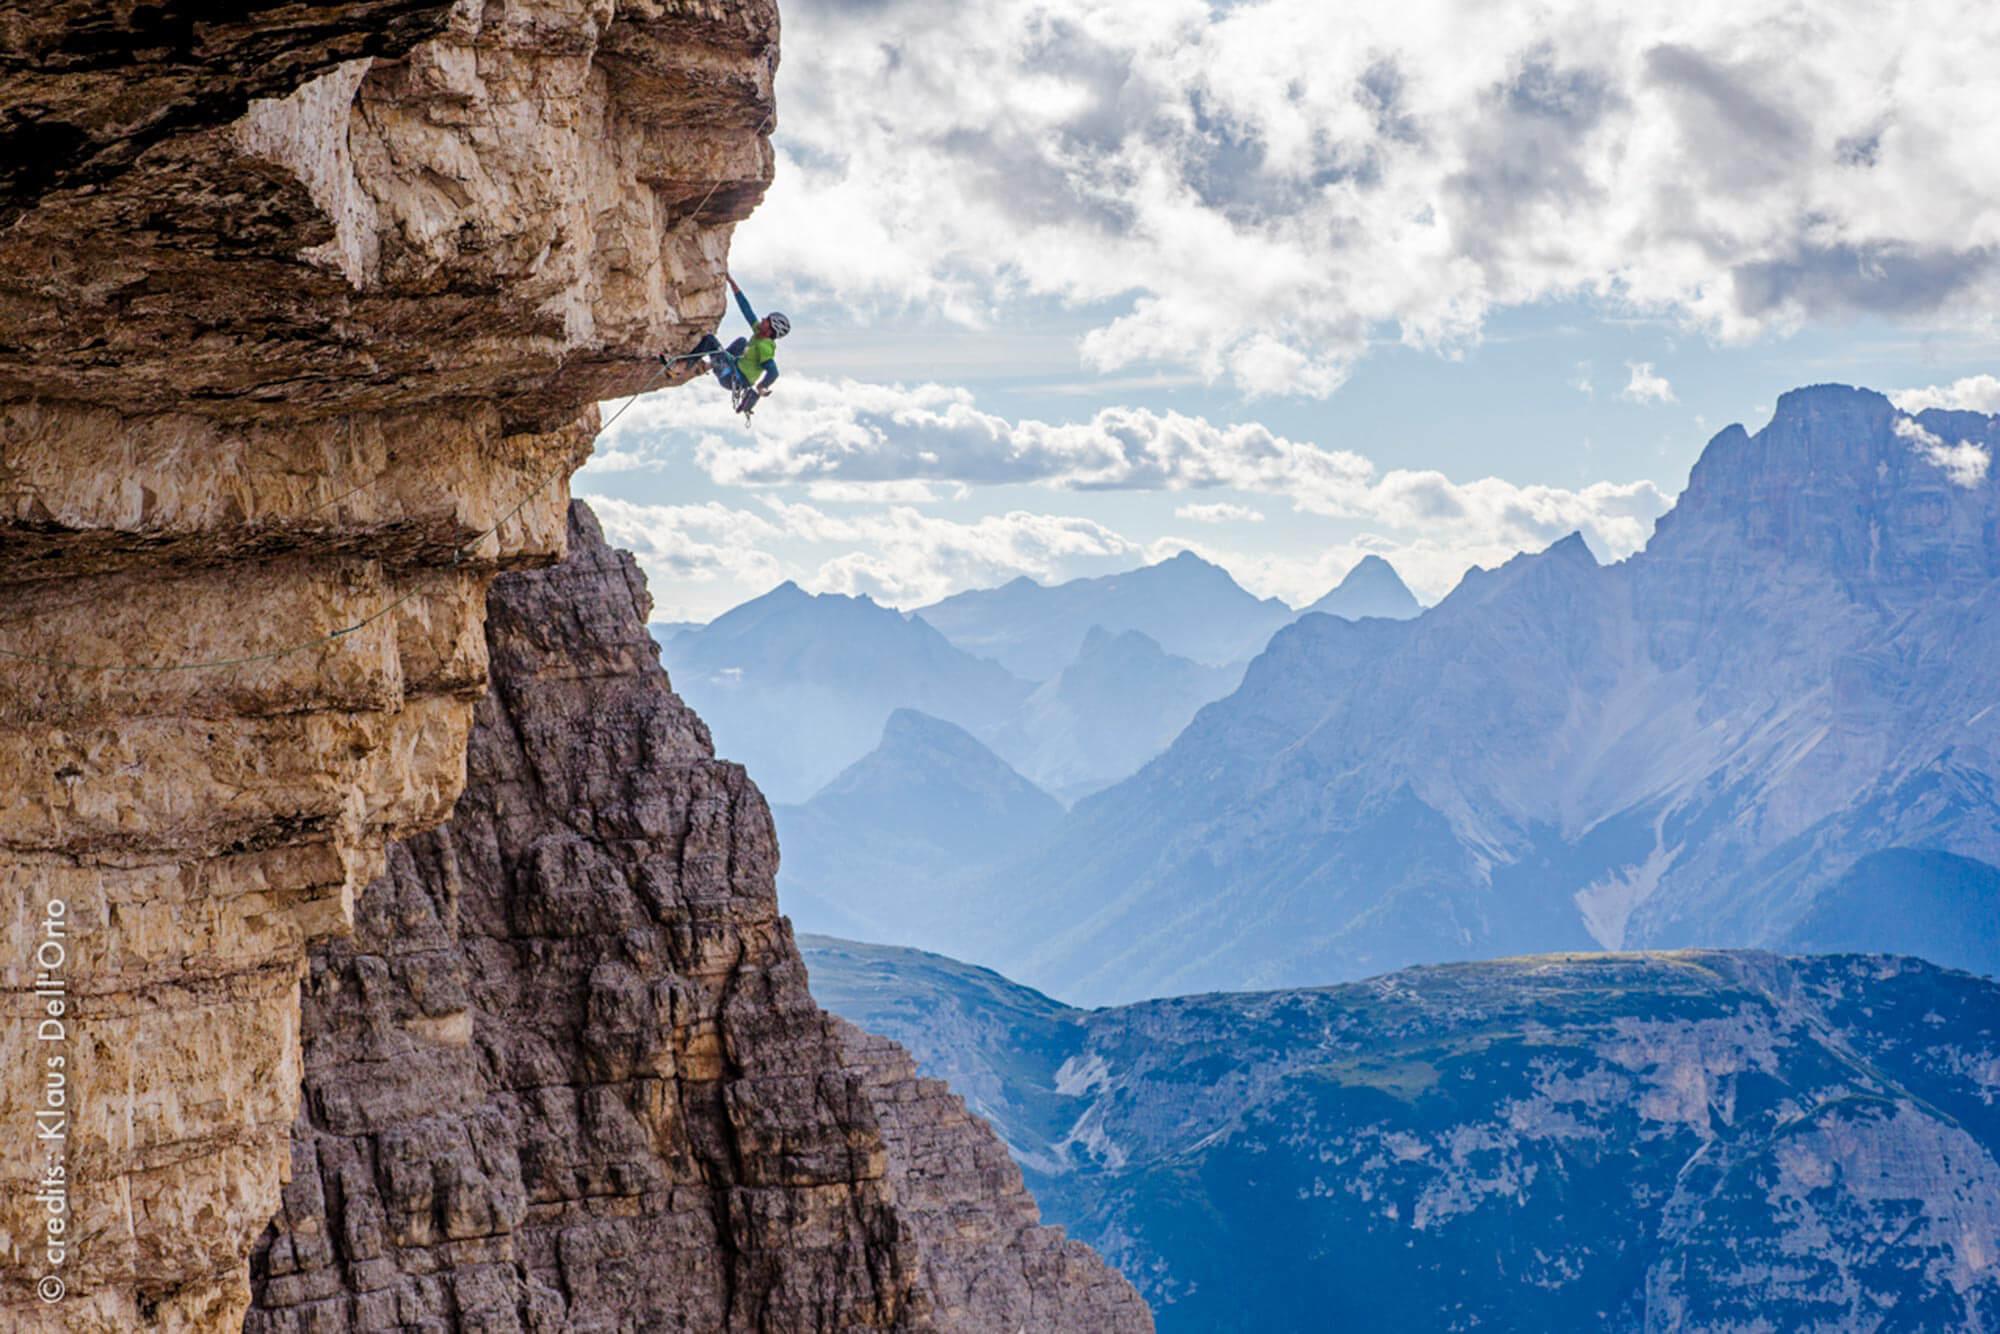 Jacopo-Larcher-climb-03